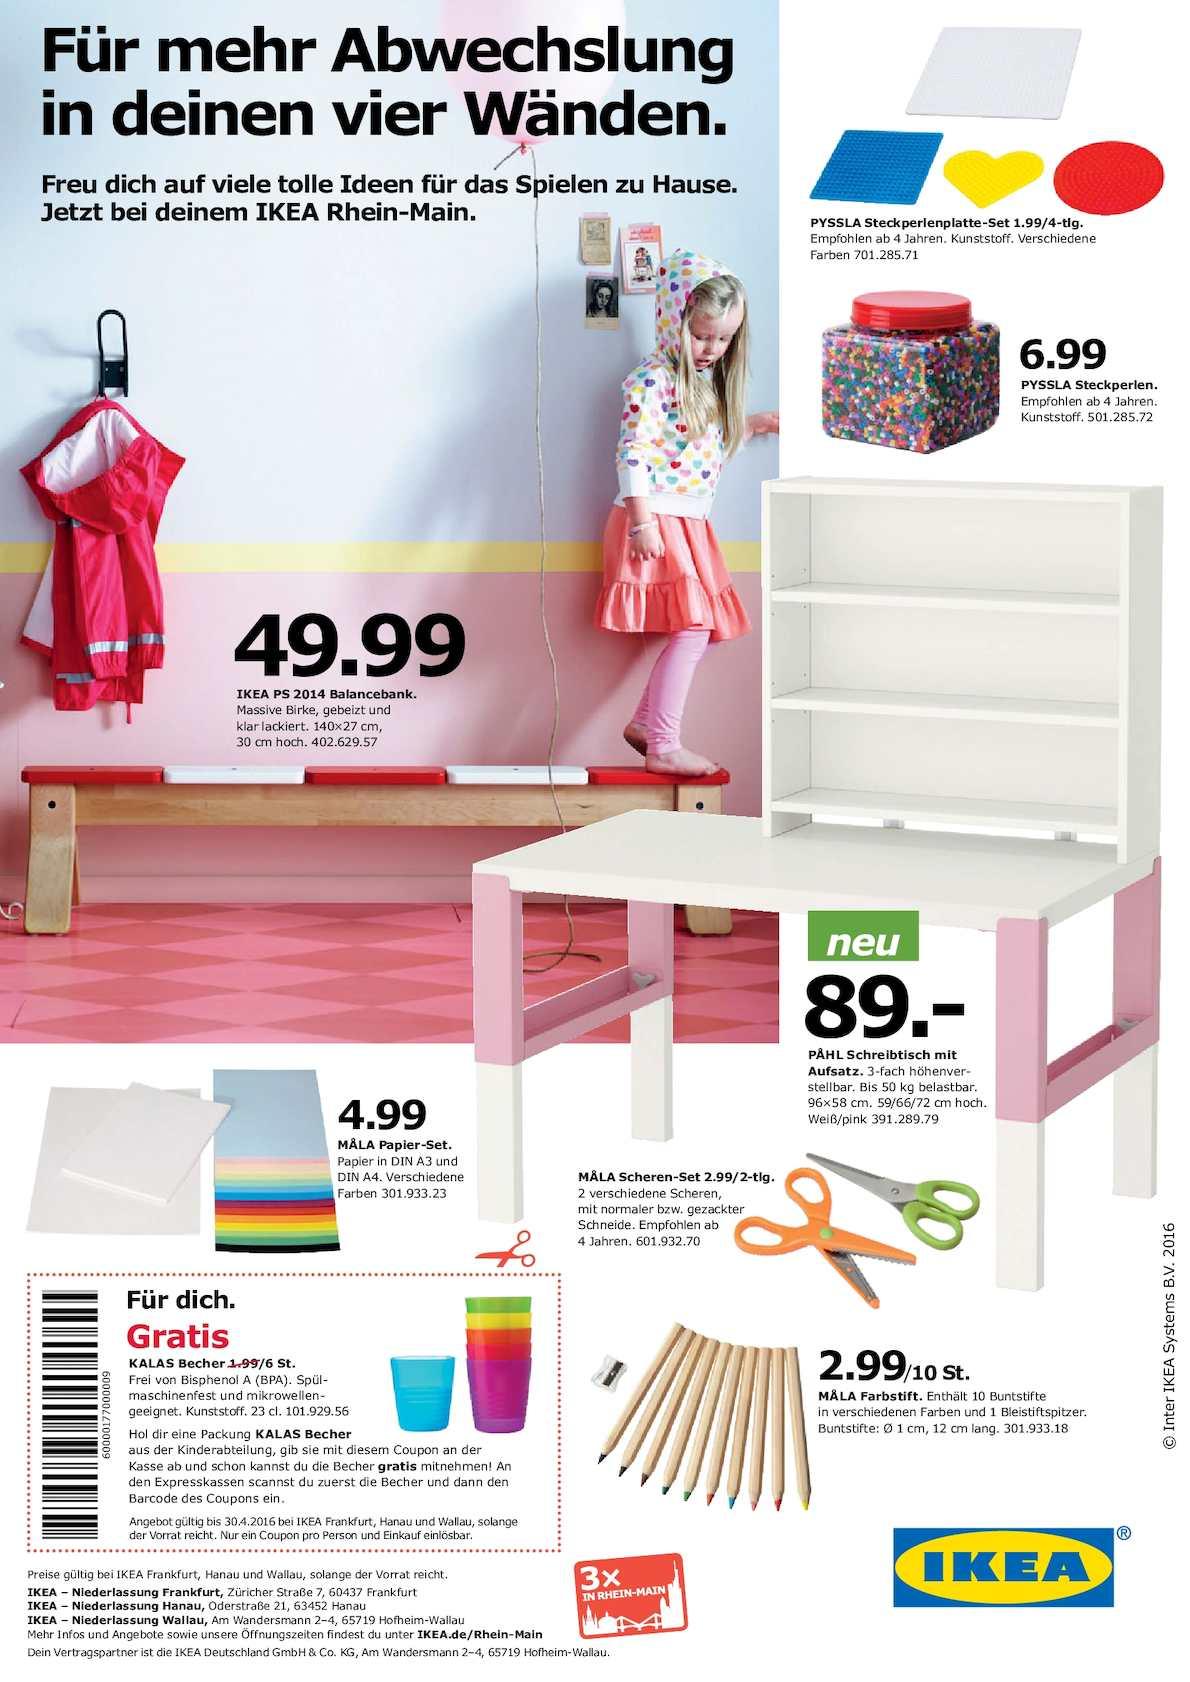 lokal rhein main gebiet ikea kalas becher. Black Bedroom Furniture Sets. Home Design Ideas